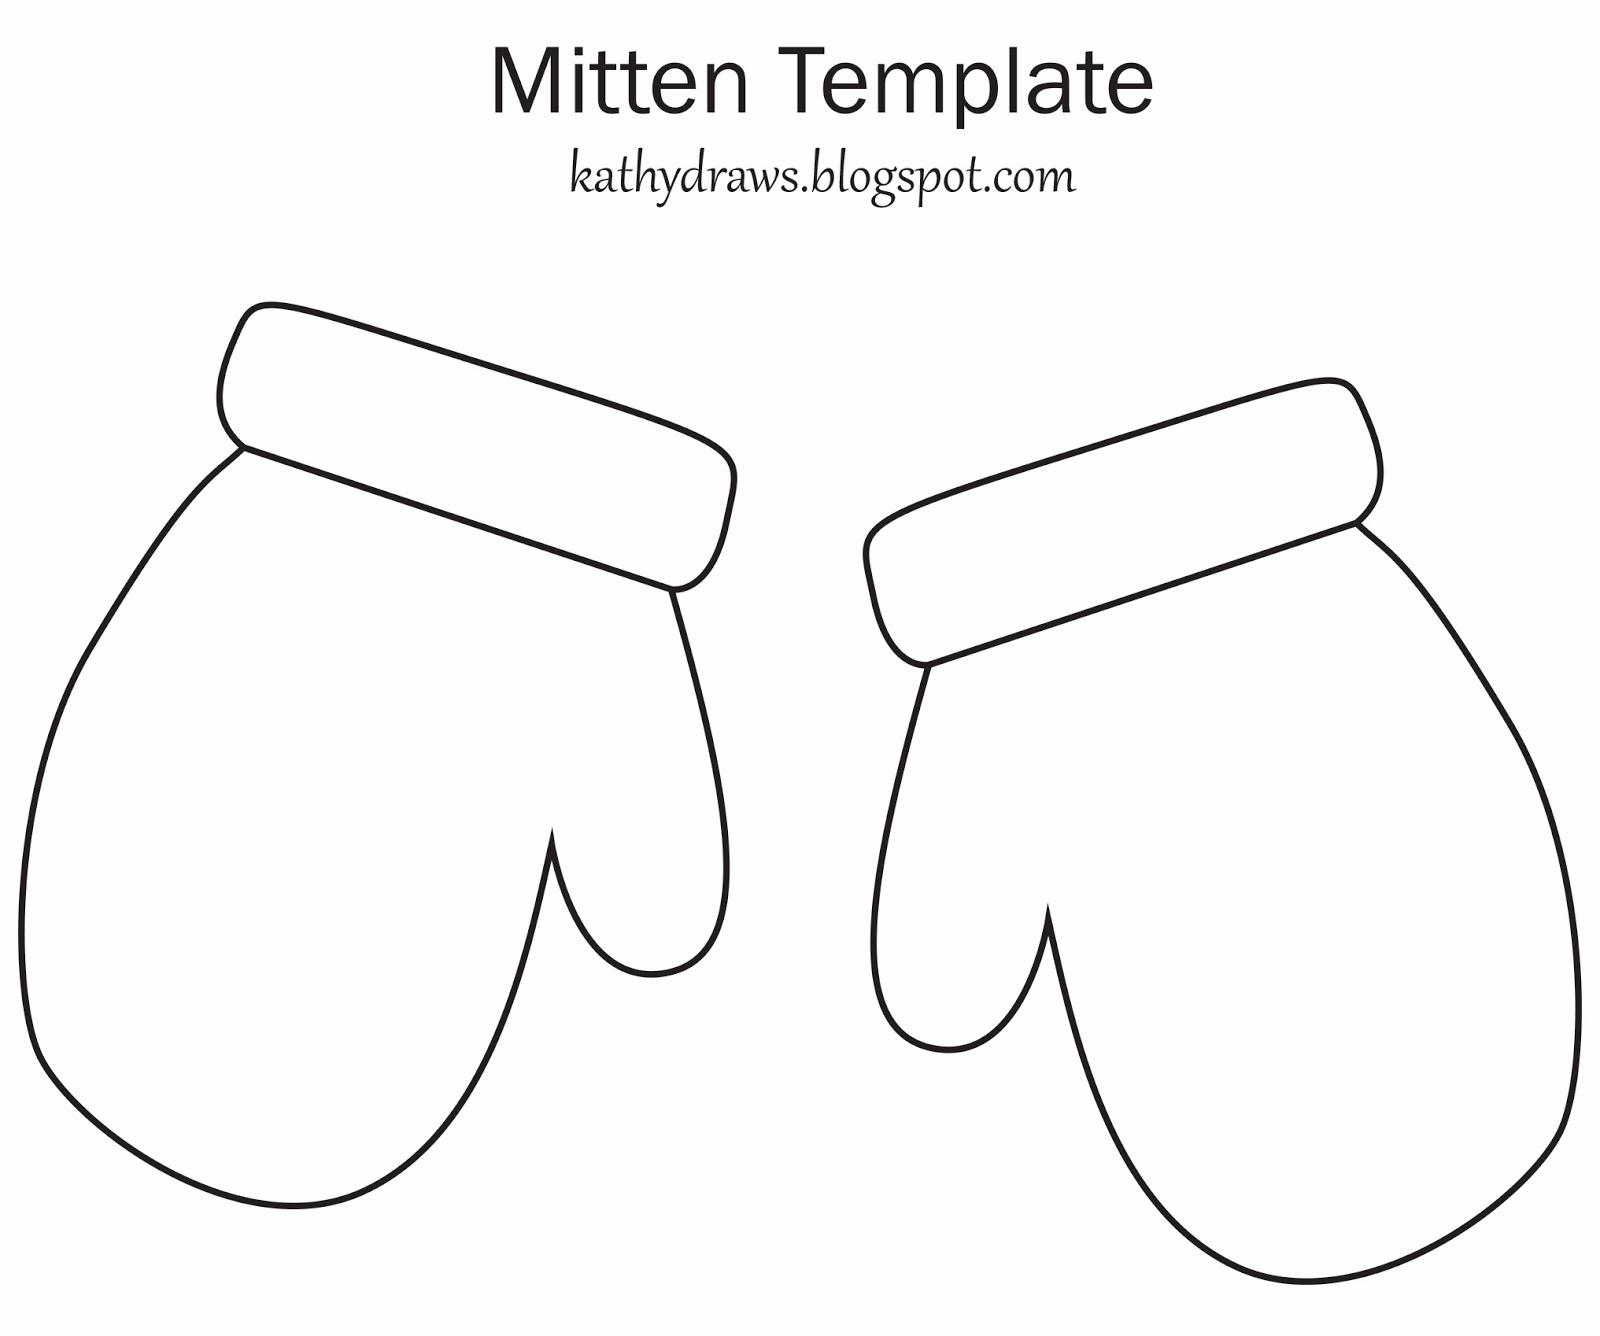 Mitten outline clipart